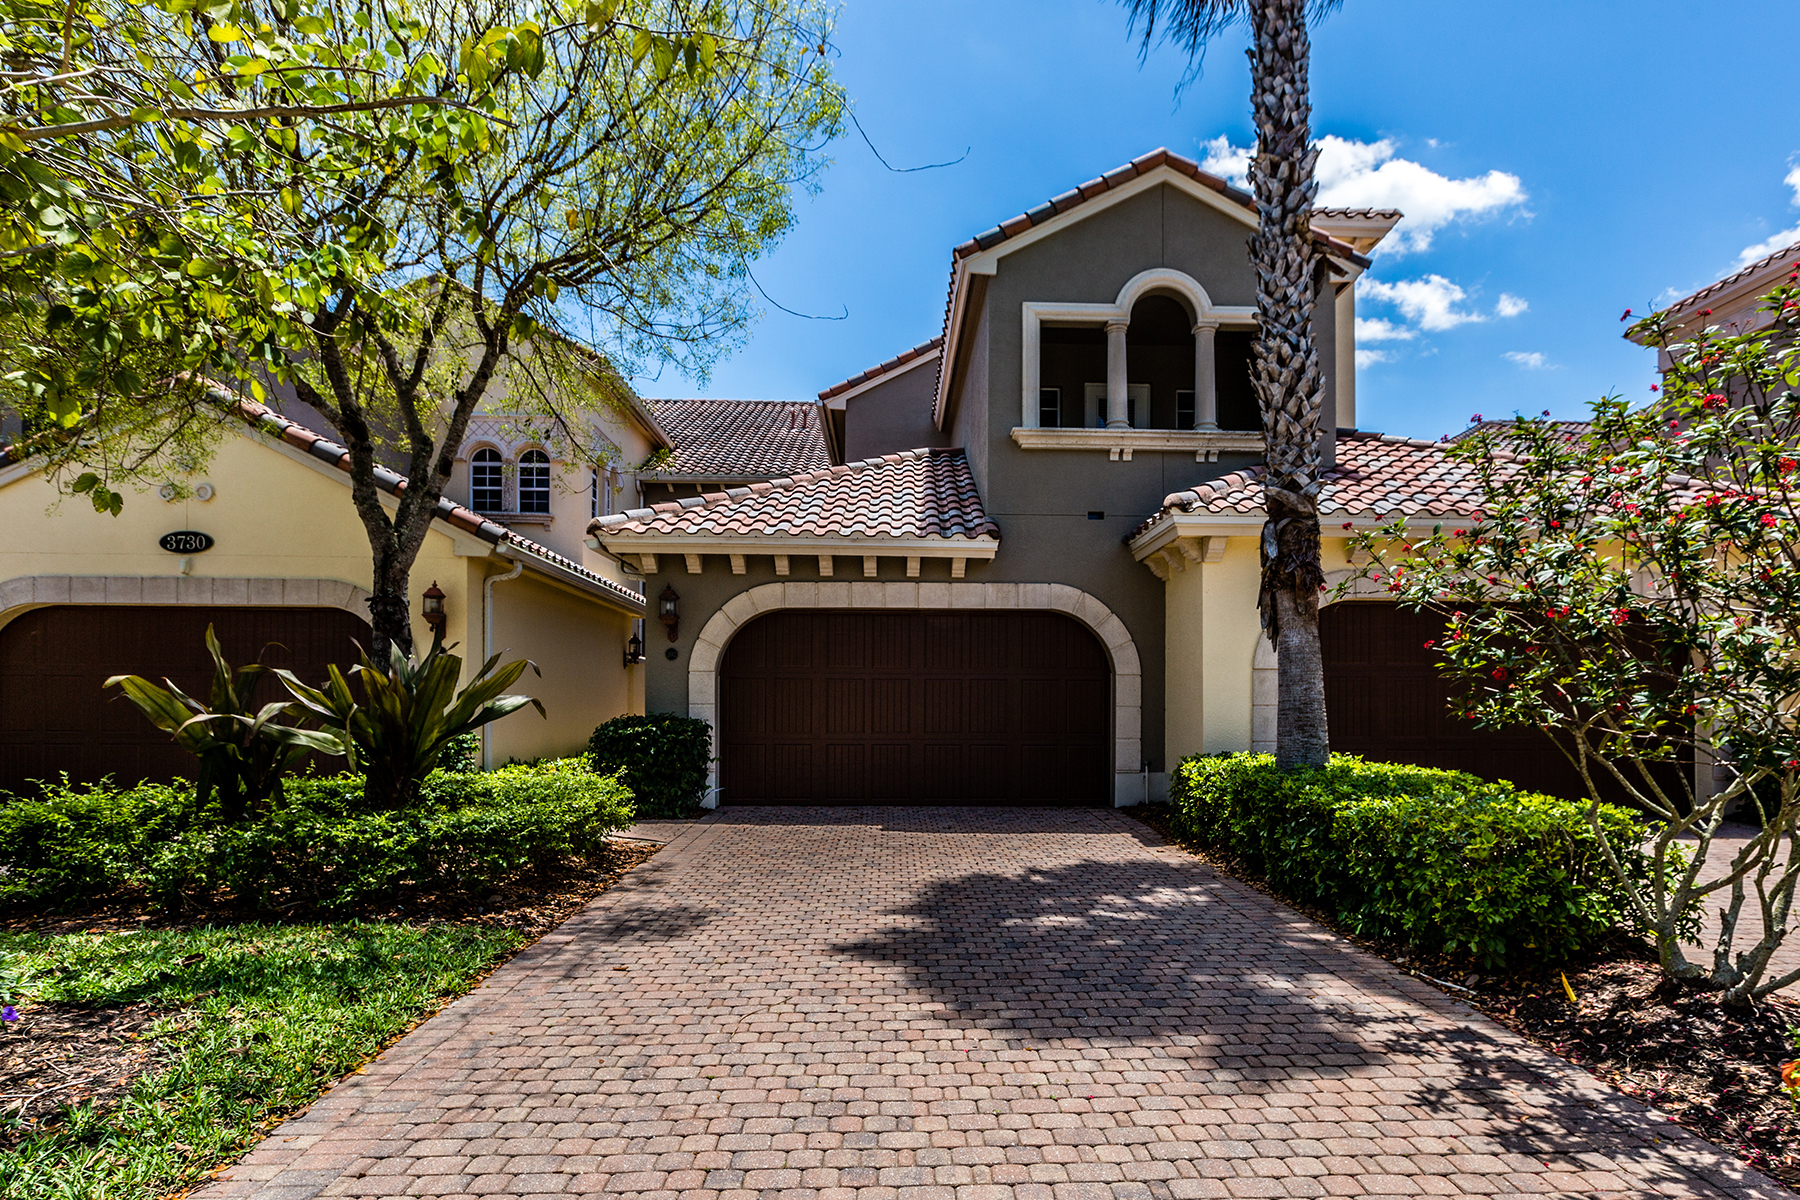 Condominio per Vendita alle ore FEDDLERS CREEK - MONTREUS 3730 Montreux Ln 202 Naples, Florida, 34114 Stati Uniti